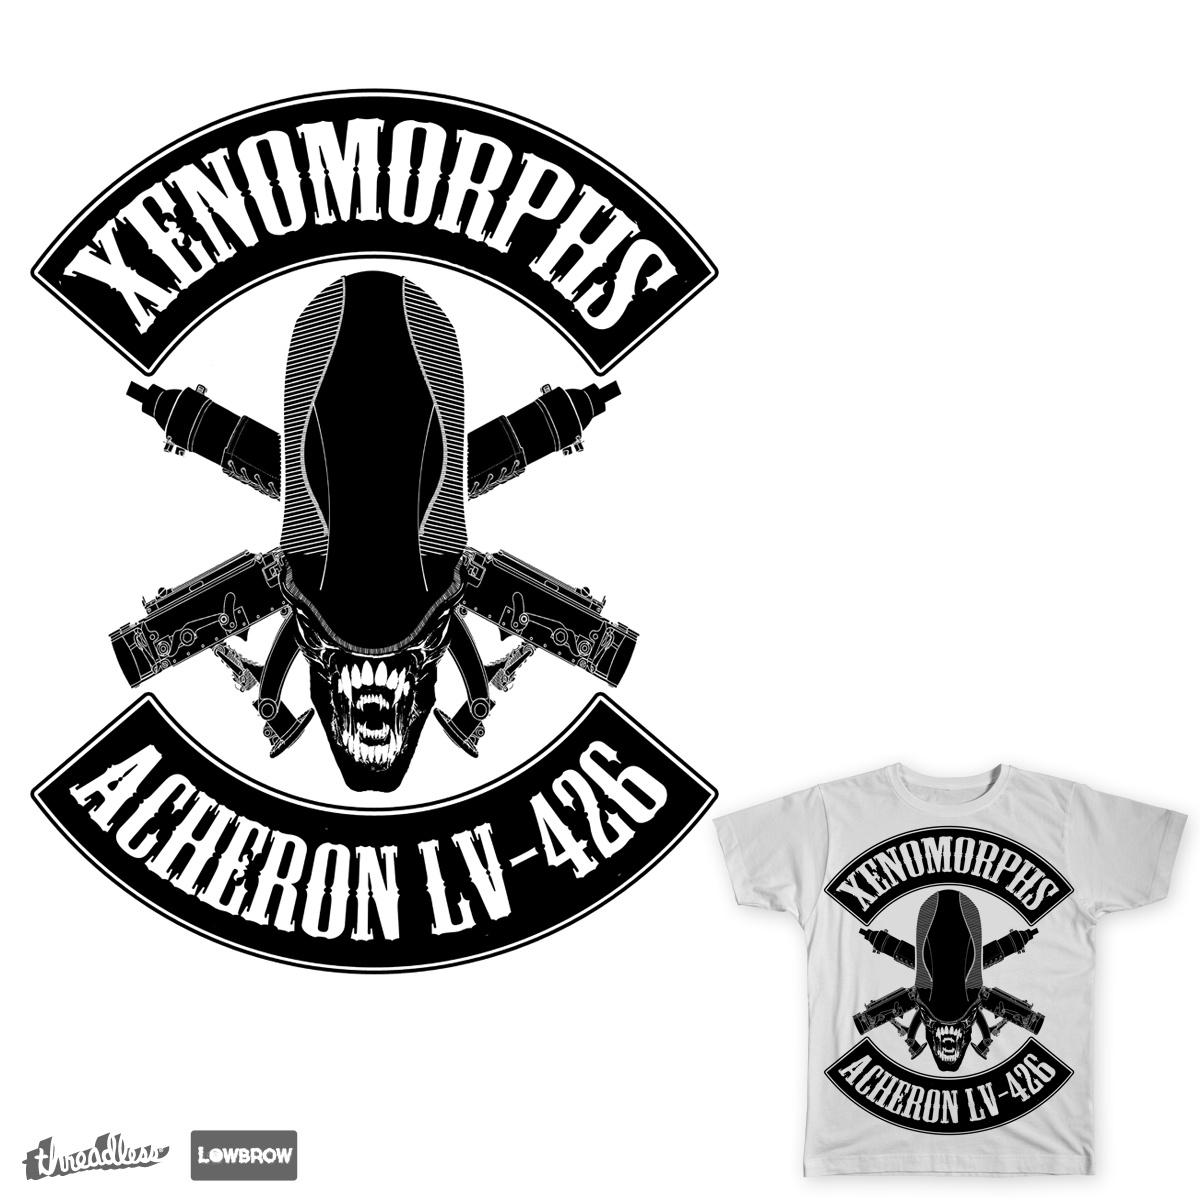 Xenomorphs by chrismckirdy on Threadless